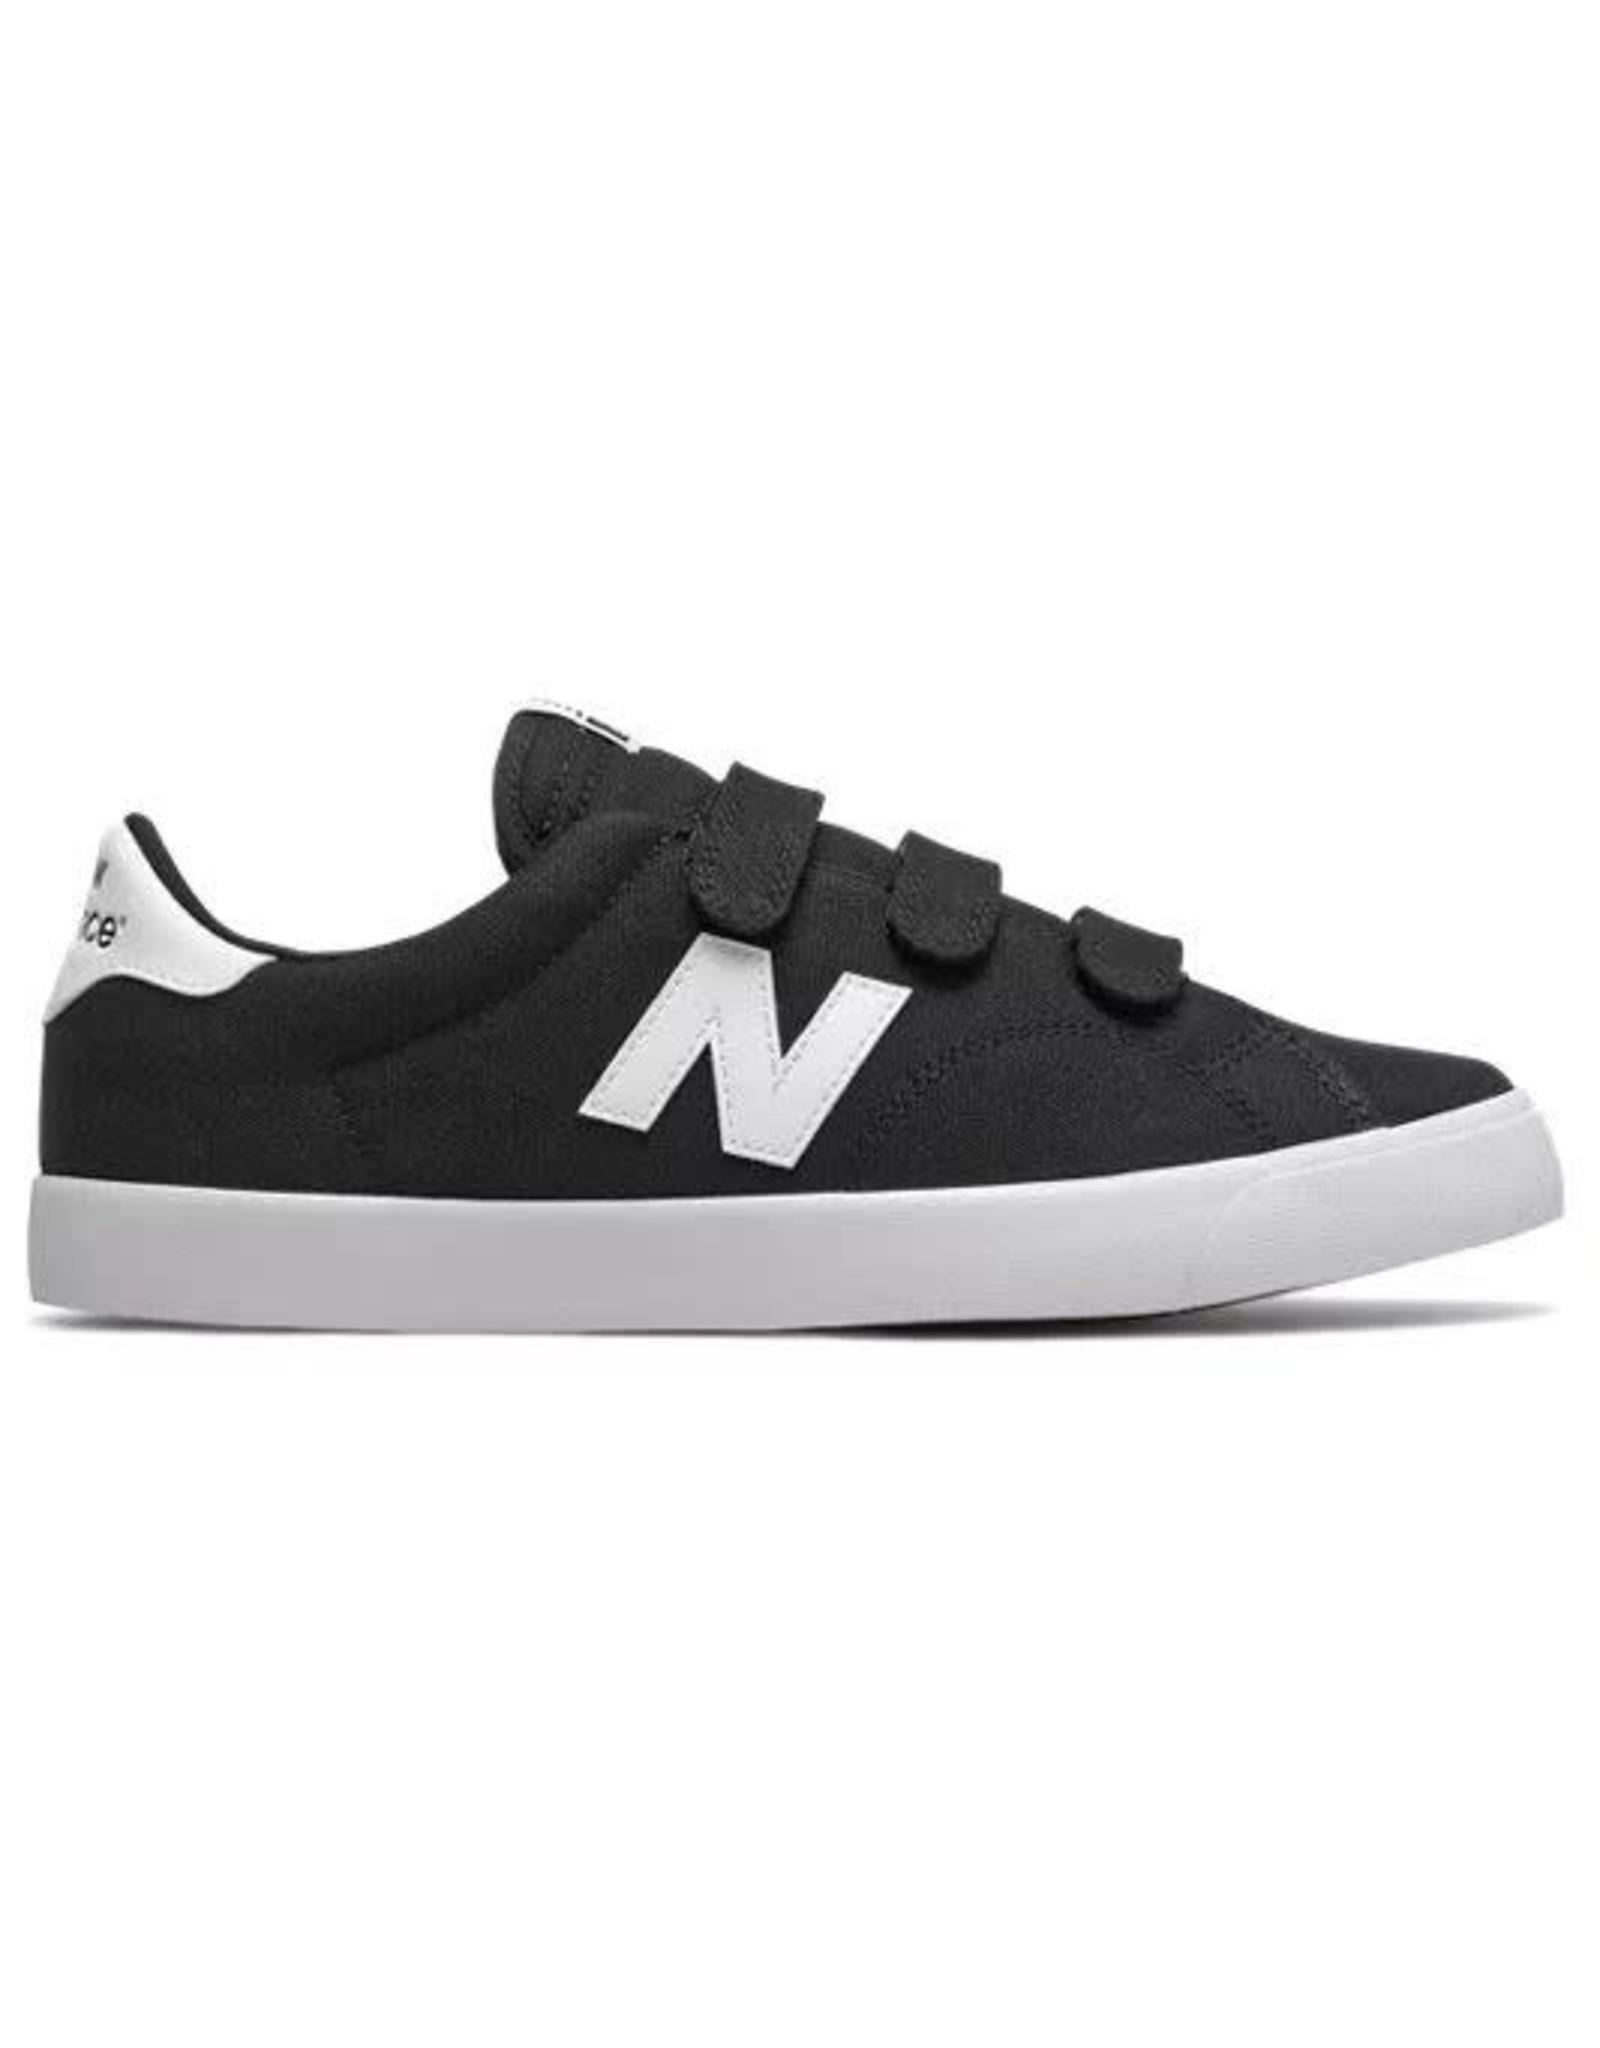 new balance NB - soulier all coasts AM210 black/white